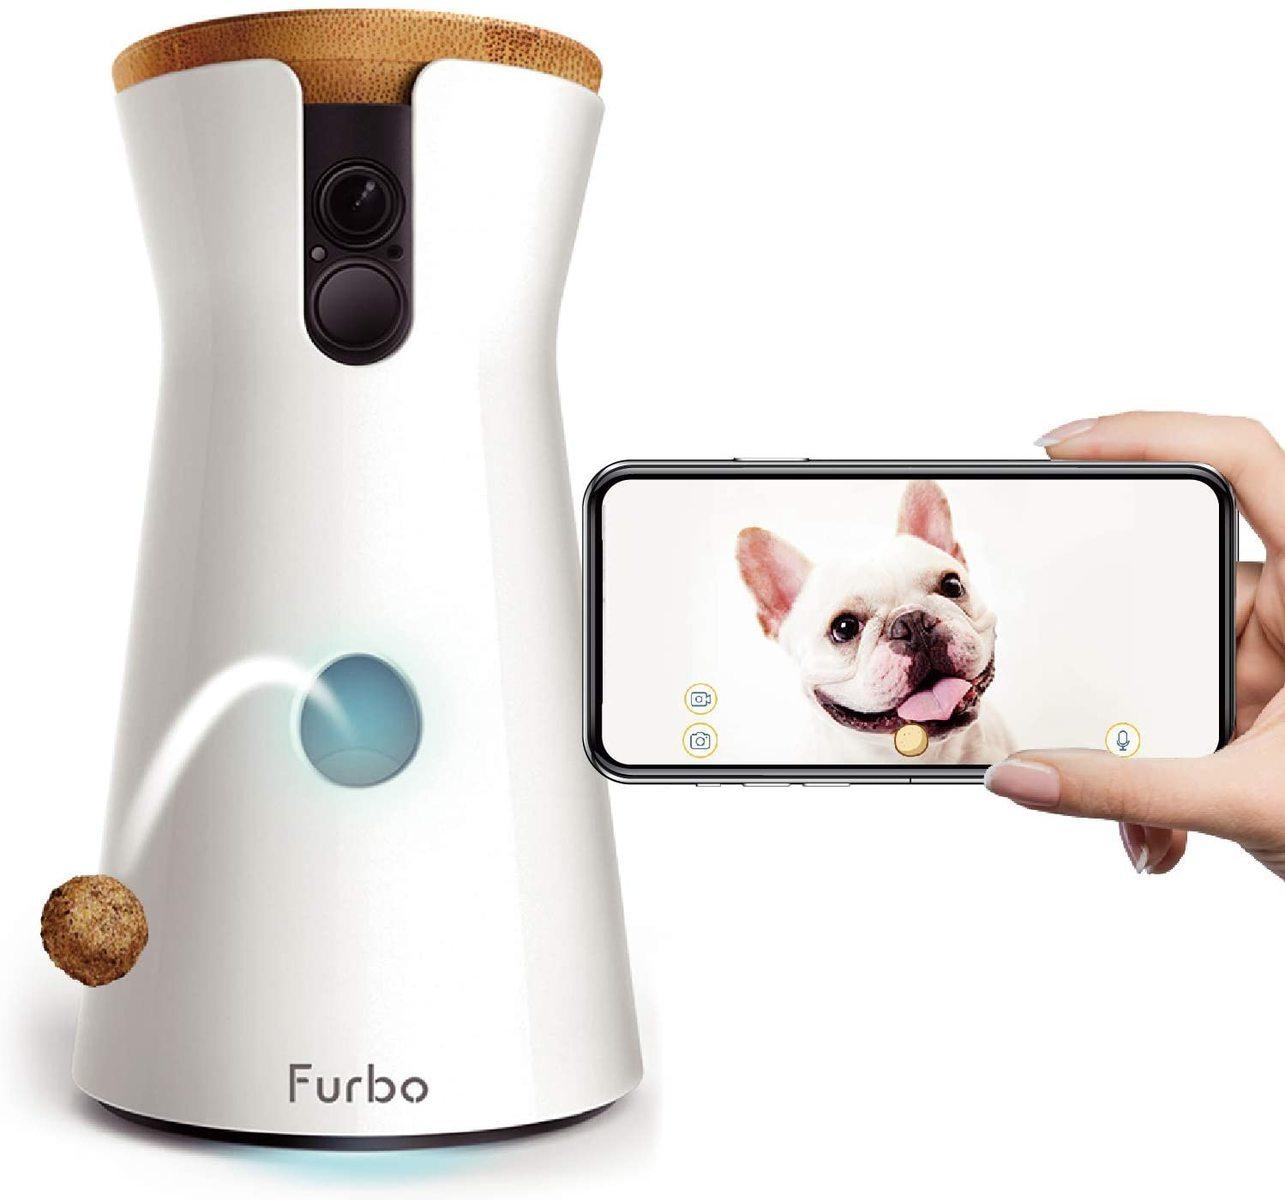 AI搭載 wifi ペットカメラ 犬 留守番 飛び出すおやつ 見守り 双方向会話 スマホ iPhone & Android 対応 アカウント共有 写真 動画 商品名 愛犬 ペット見守り お留守